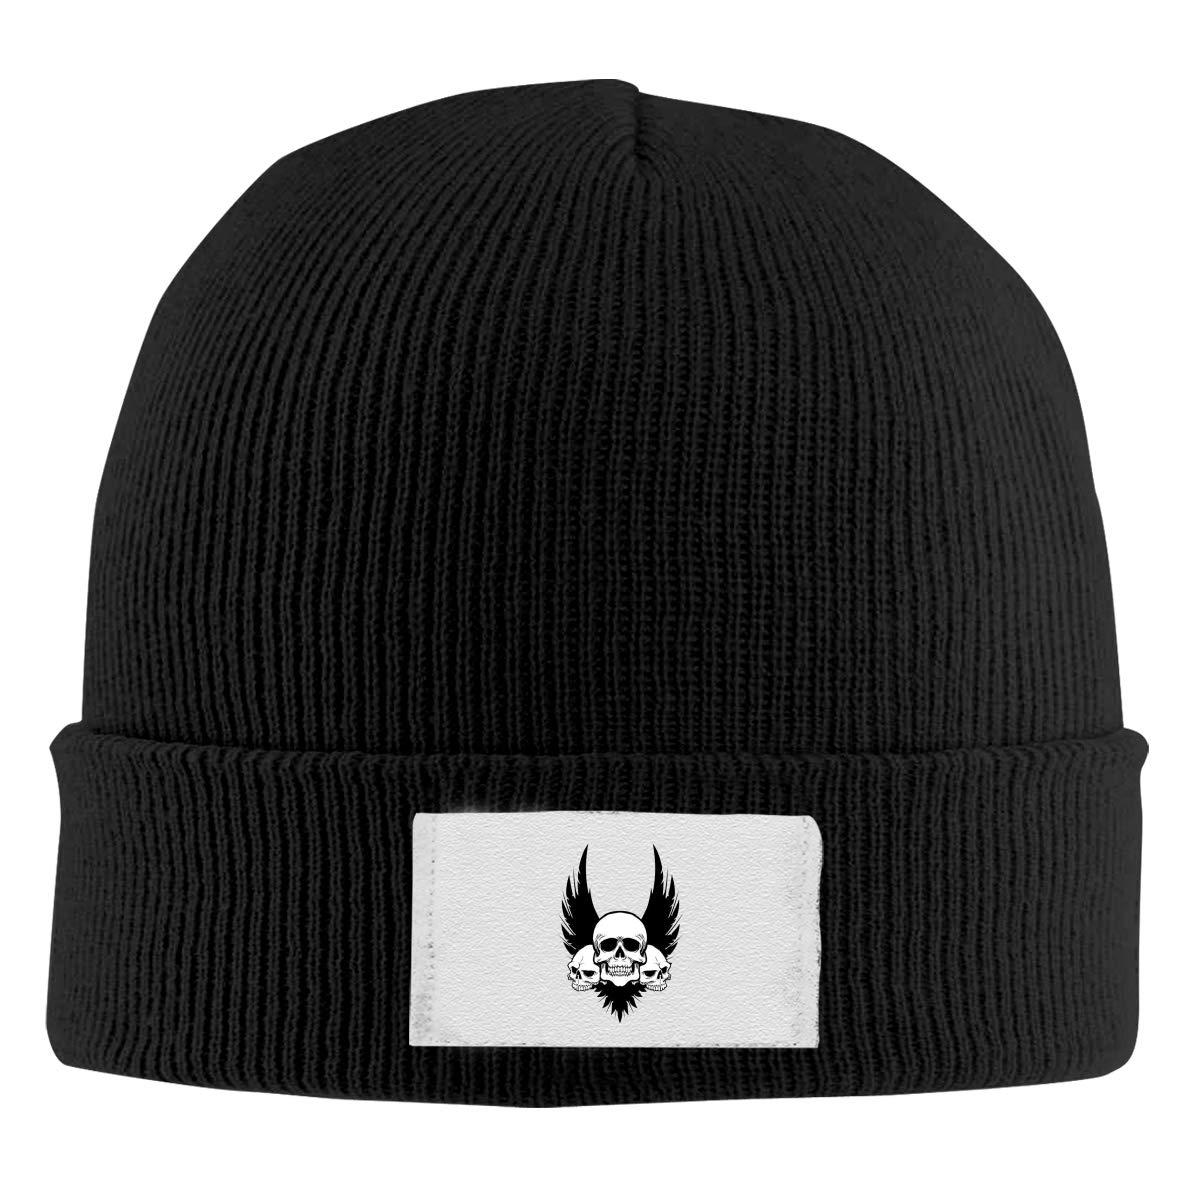 Paller Skull Knitted Hat Winter Outdoor Hat Warm Beanie Caps for Men Women